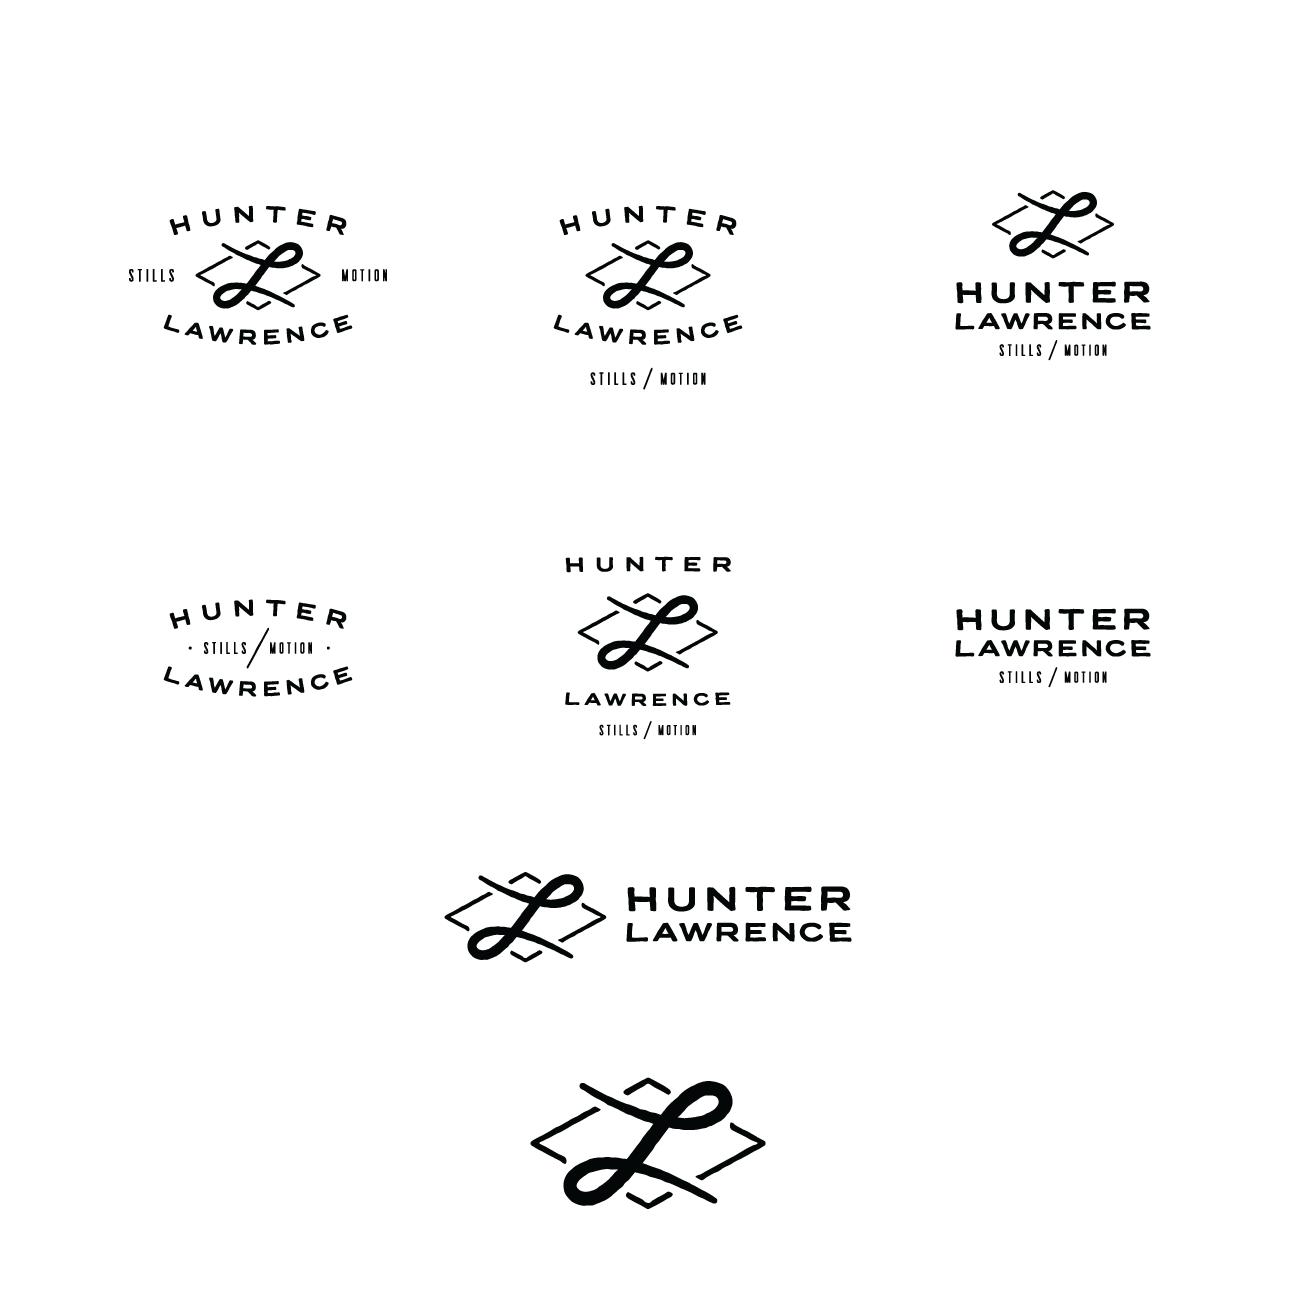 lg logo png. hl logo lg. lg png